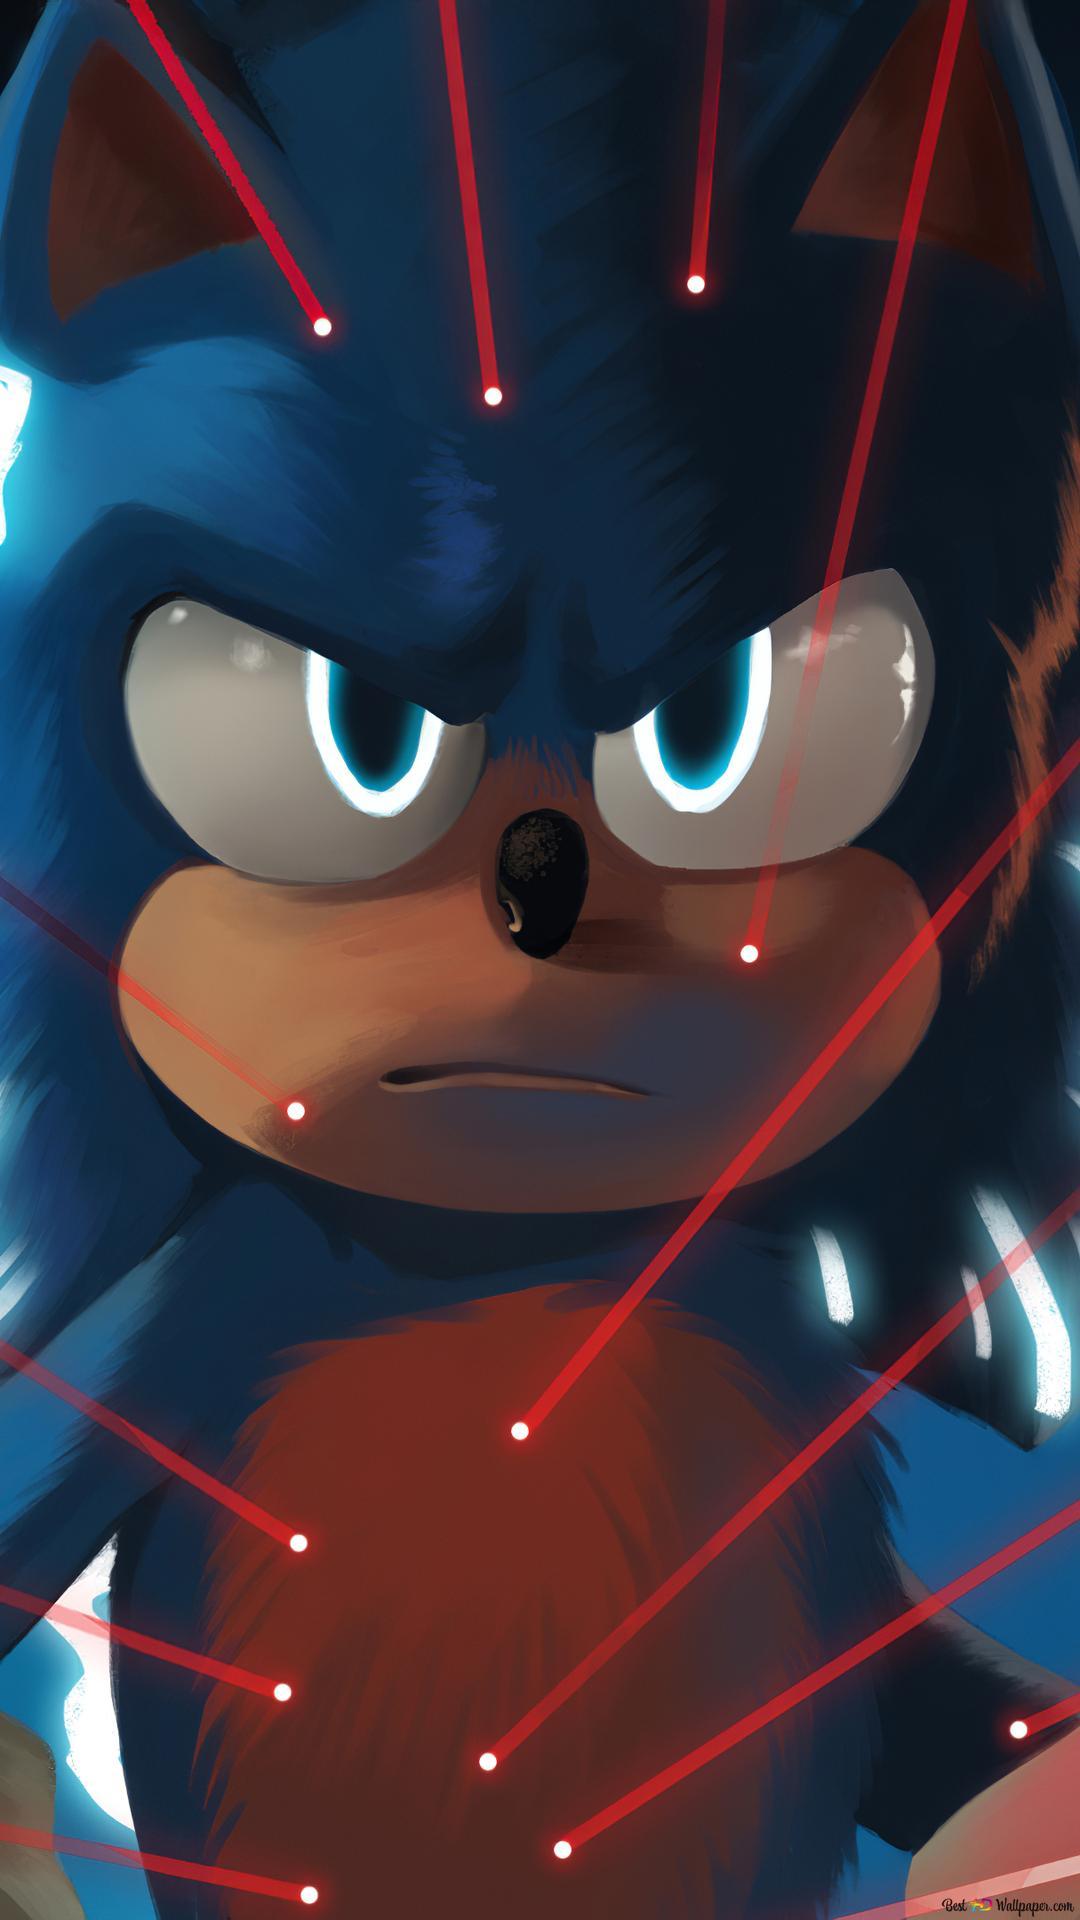 Sonic The Hedgehog Movie Hd Wallpaper Download